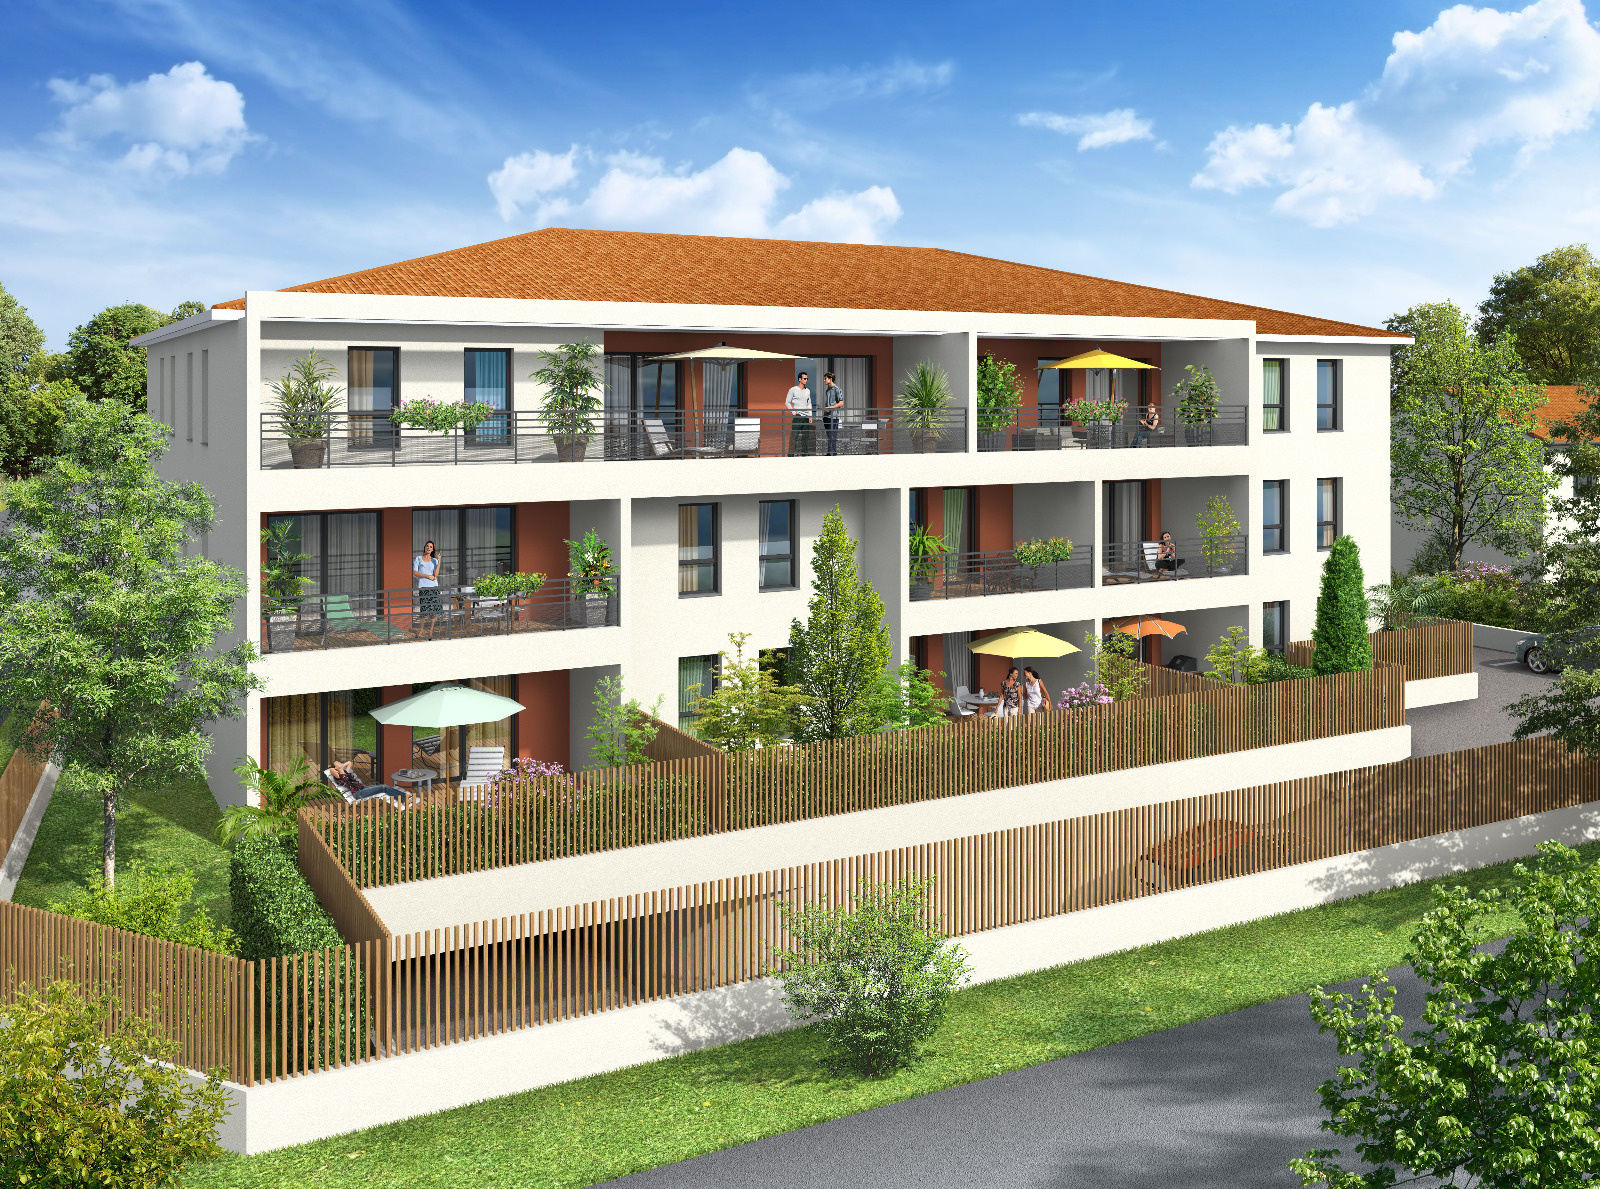 Challeng 39 patrimoine lyon centre ville genas meyzieu for Acheter appartement neuf sans apport